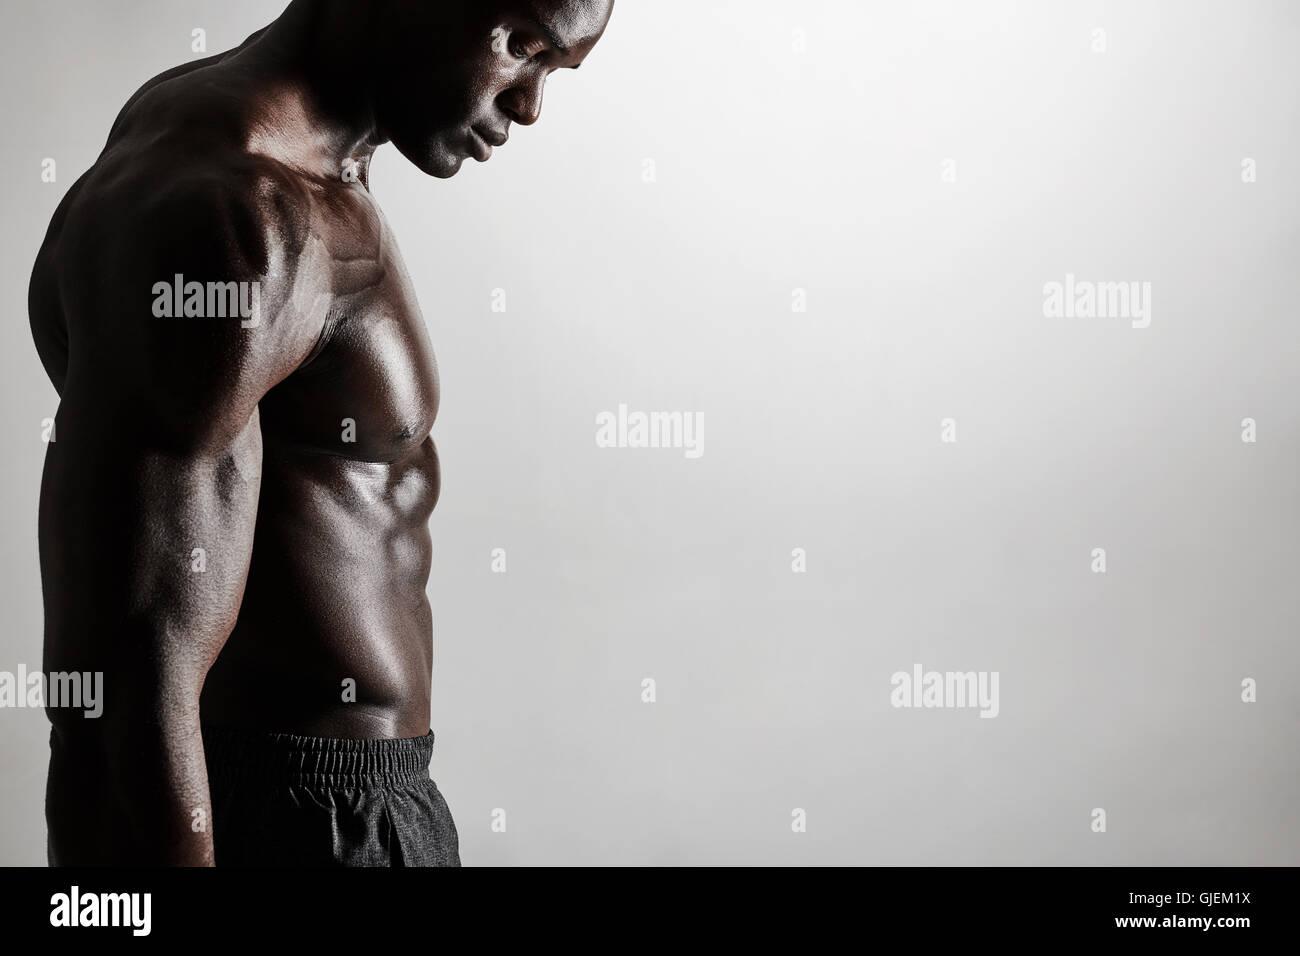 Man Torso Side View Stockfotos & Man Torso Side View Bilder - Alamy